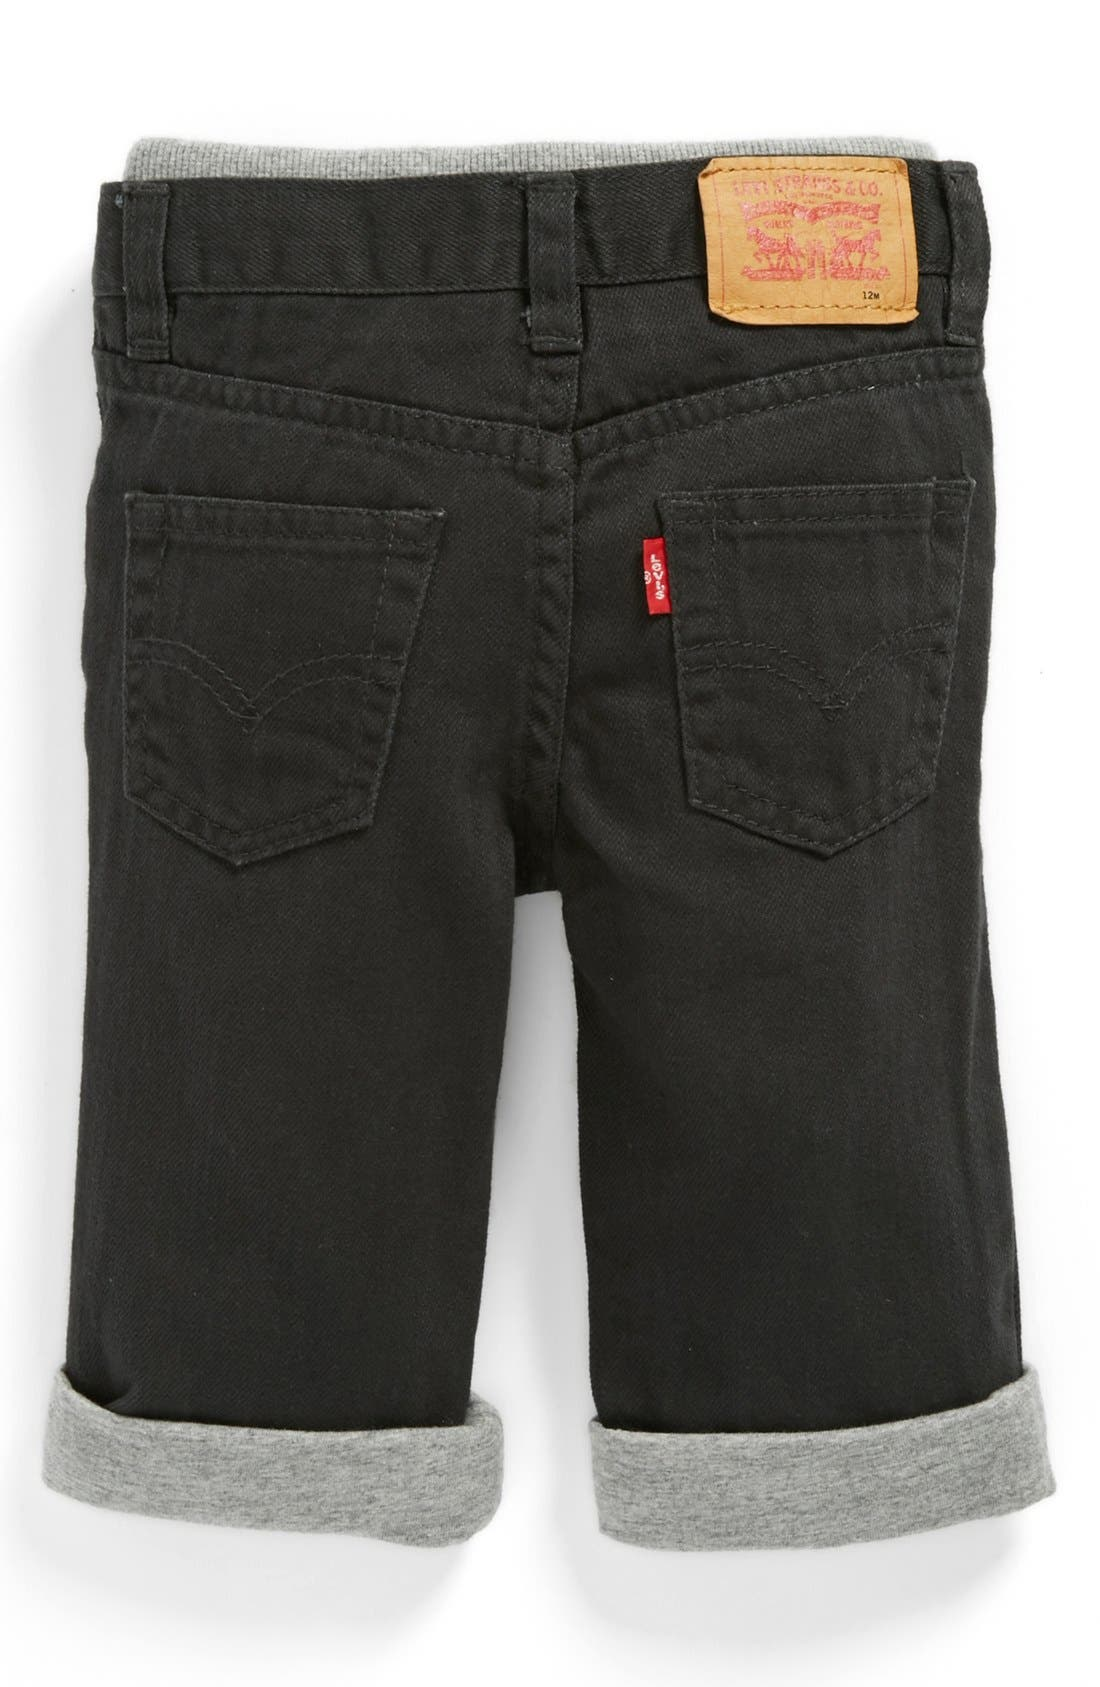 Main Image - Levi's® '514™' Straight Leg Jeans (Baby)